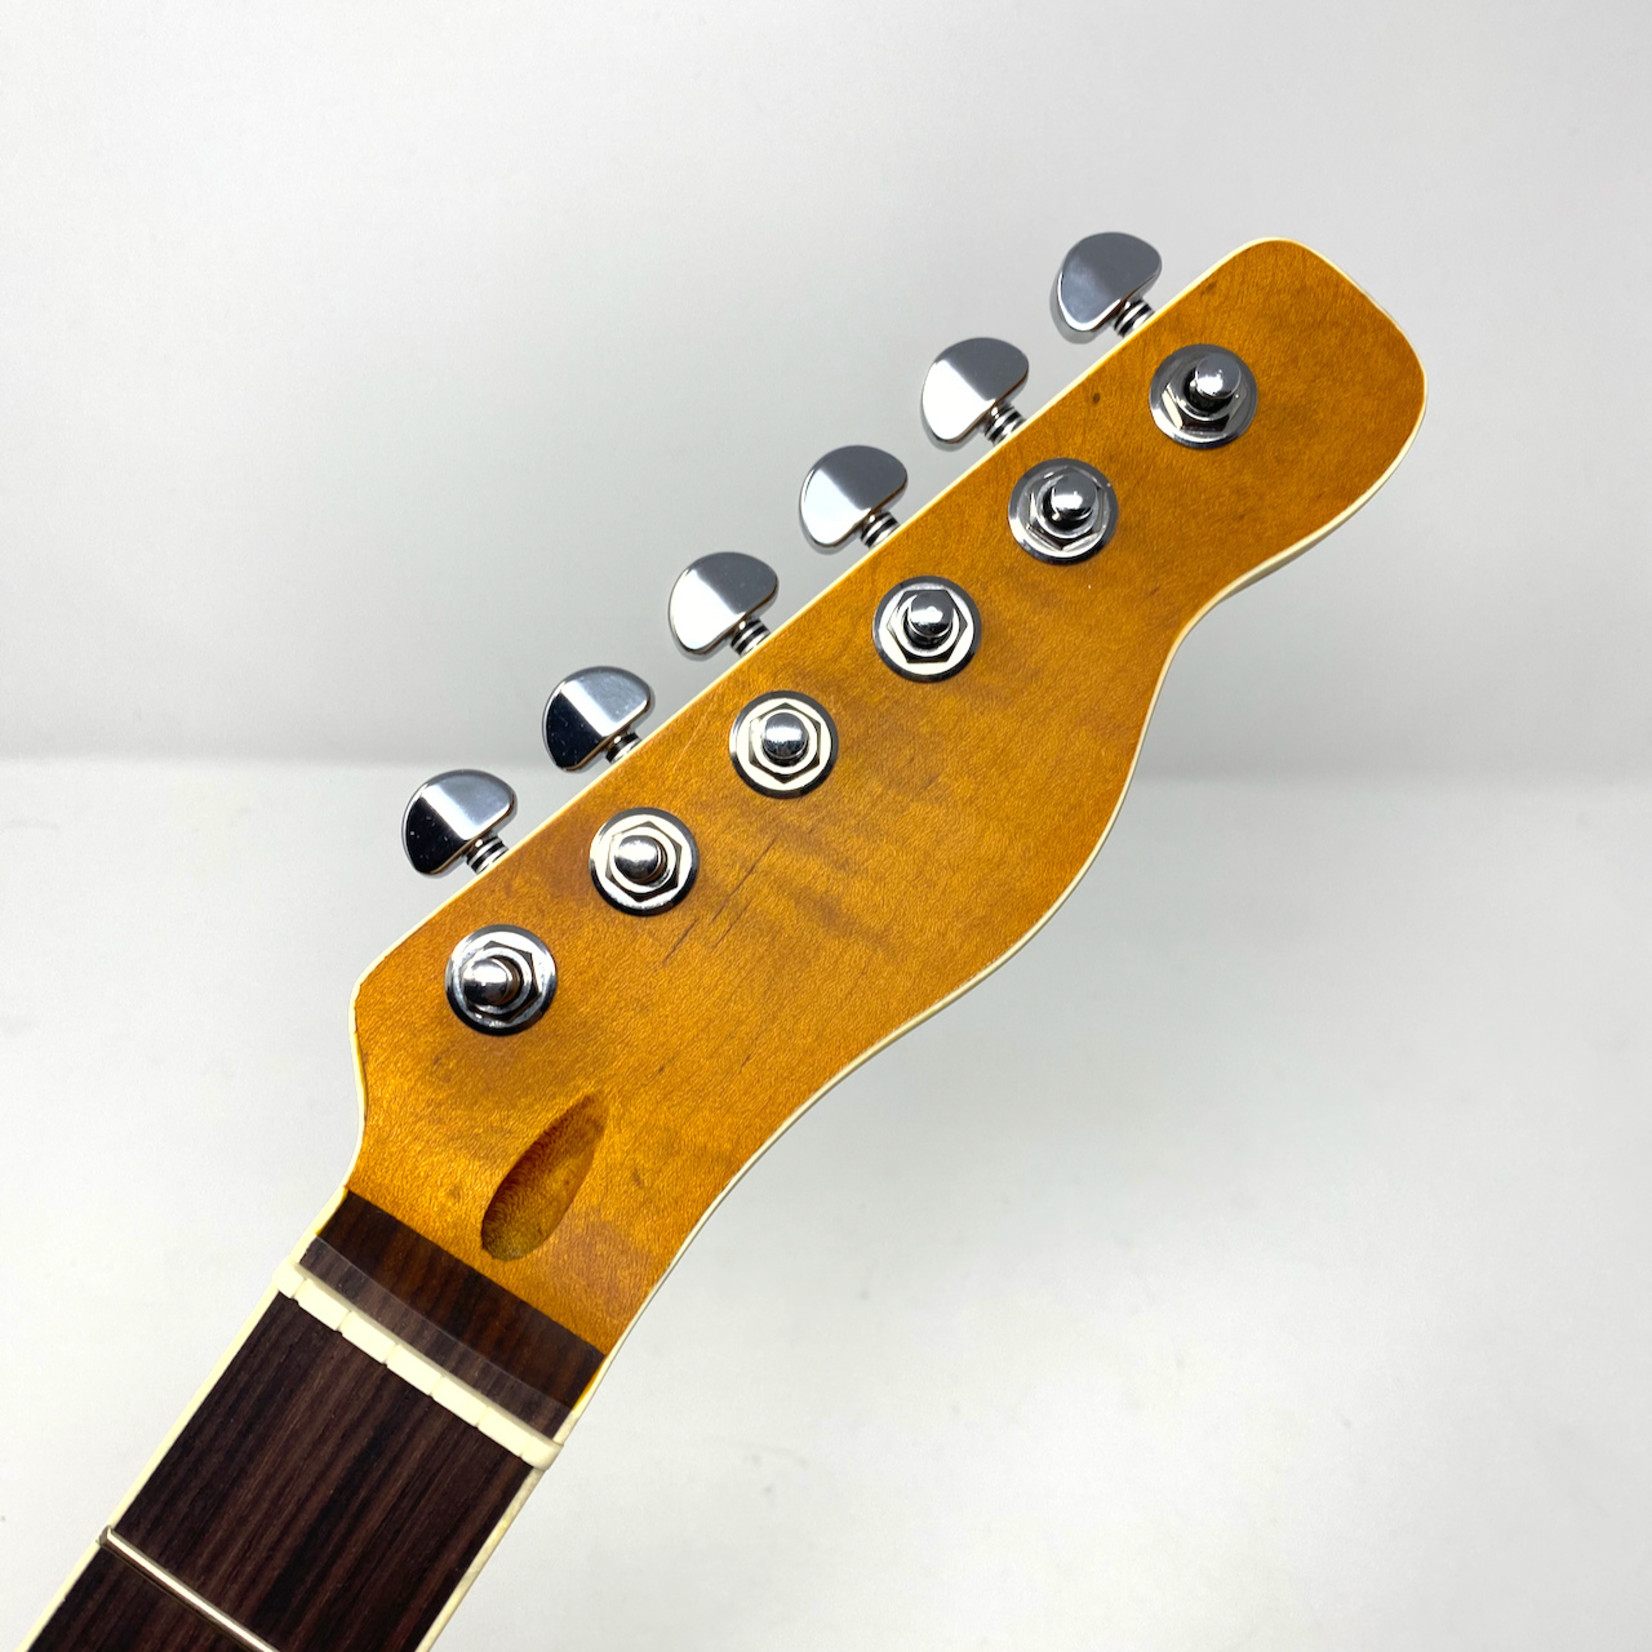 Belltone Tele-Style Roasted Flame Maple Neck with Rosewood Fingerboard, Cream Binding, Belltone Lockers™ Locking Tuners